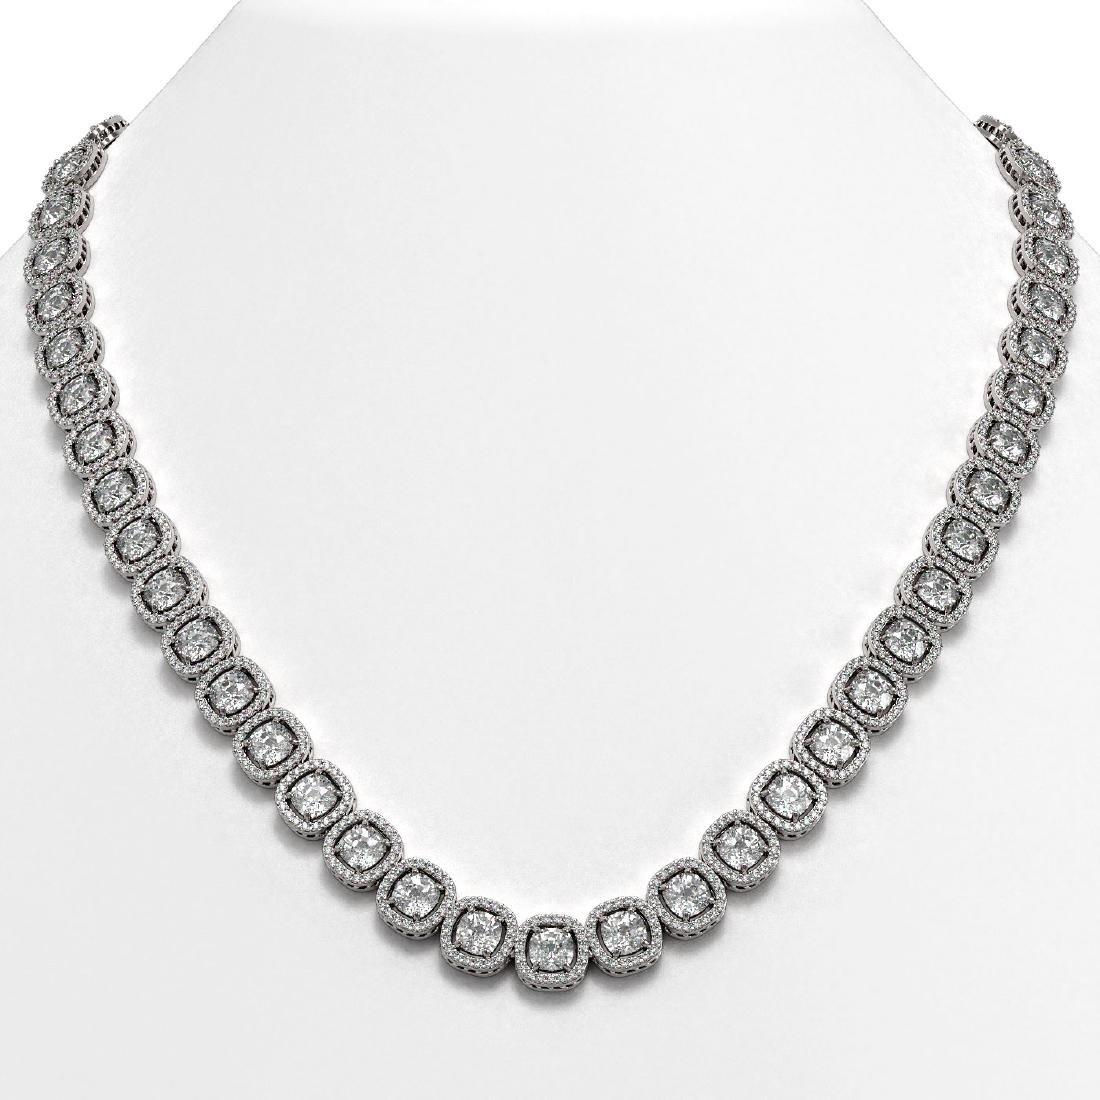 32.64 CTW Cushion Diamond Designer Necklace 18K White